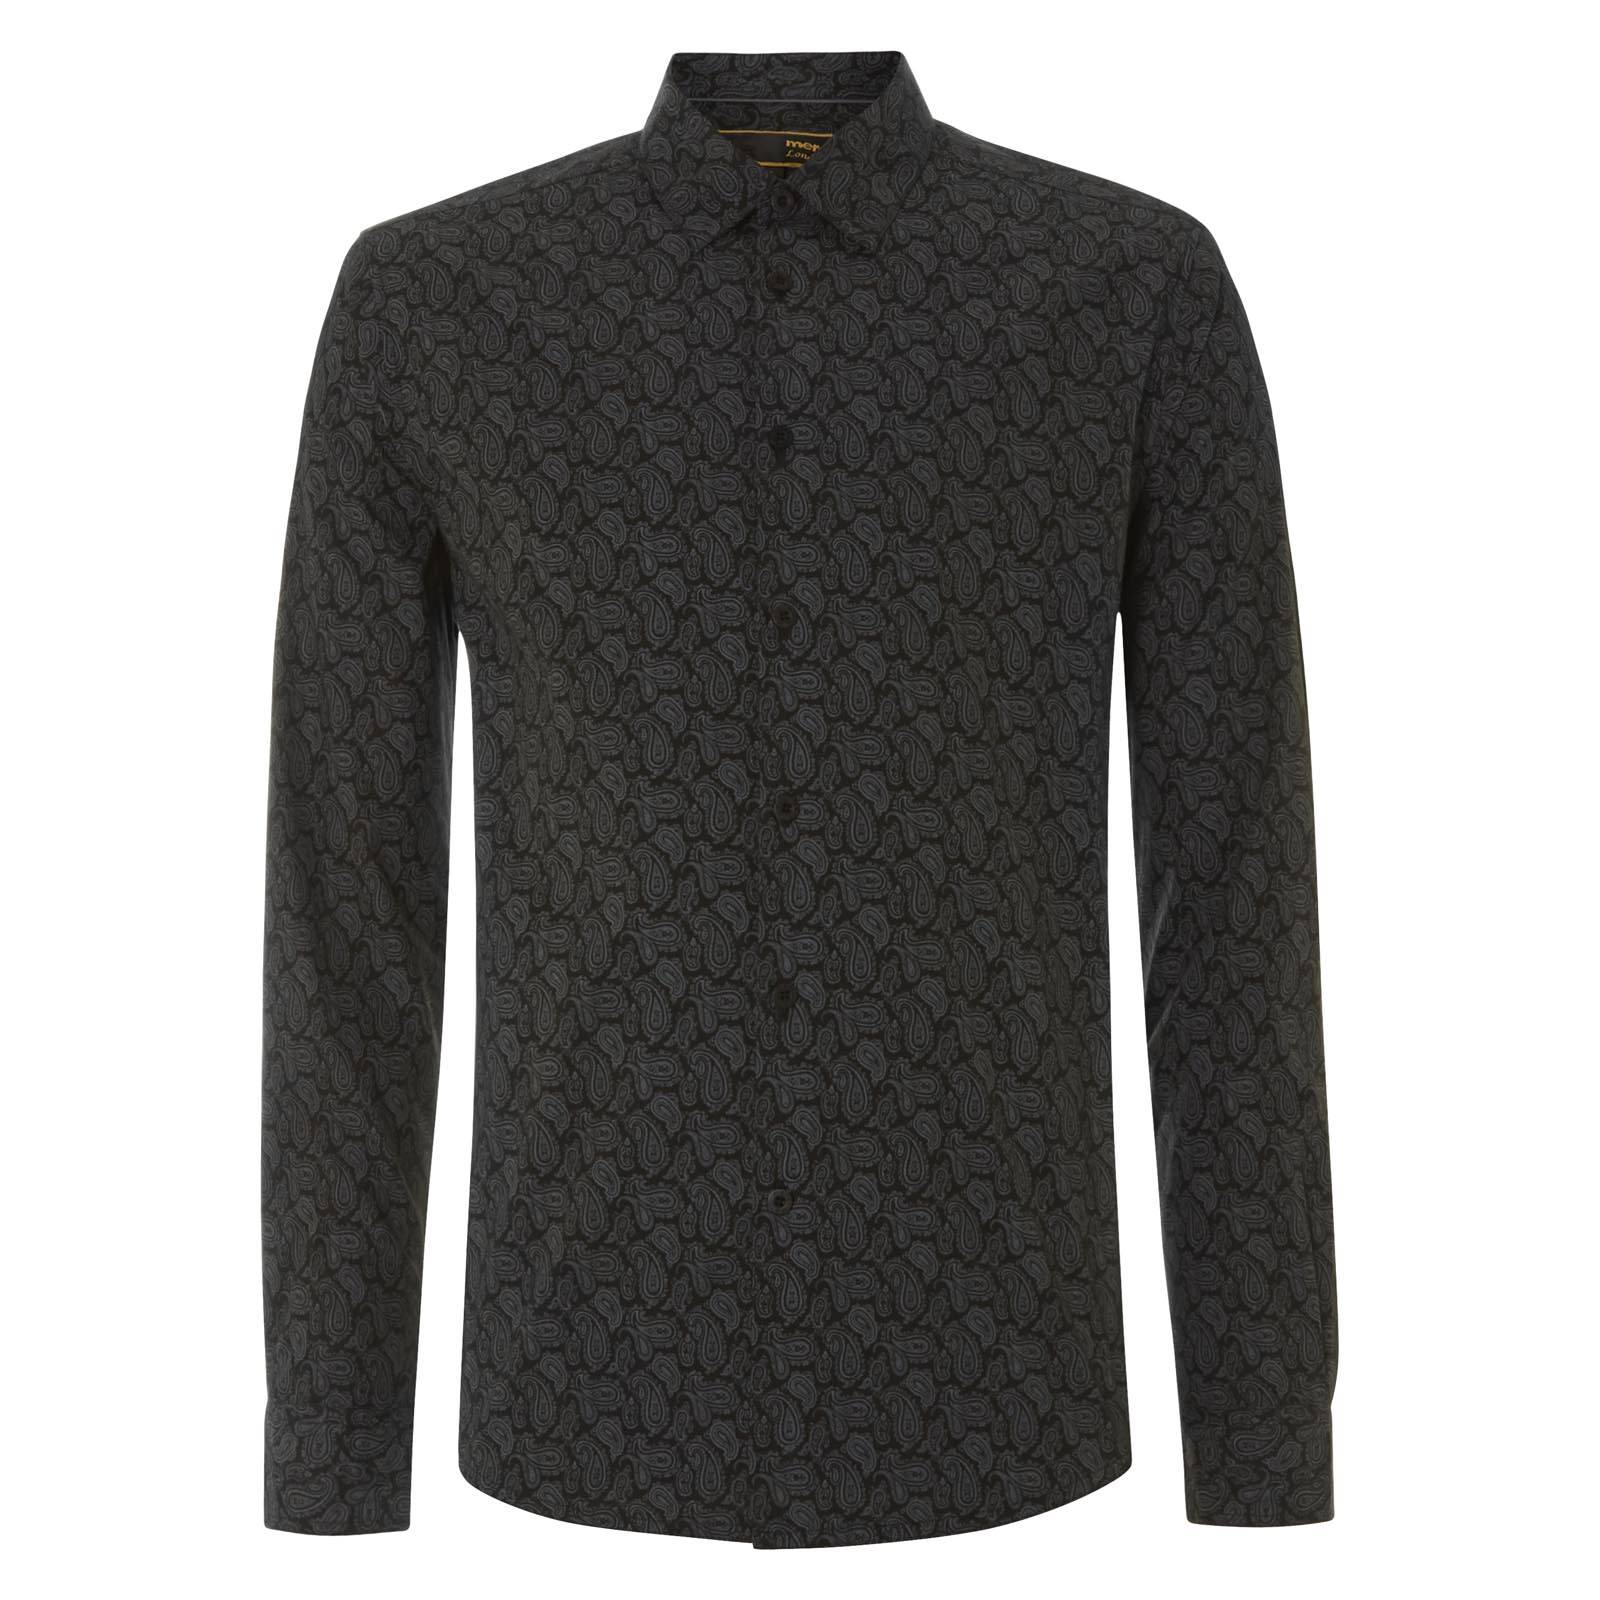 Рубашка YorkРубашки<br><br><br>Артикул: 1514202<br>Материал: 100% хлопок<br>Цвет: черный<br>Пол: Мужской